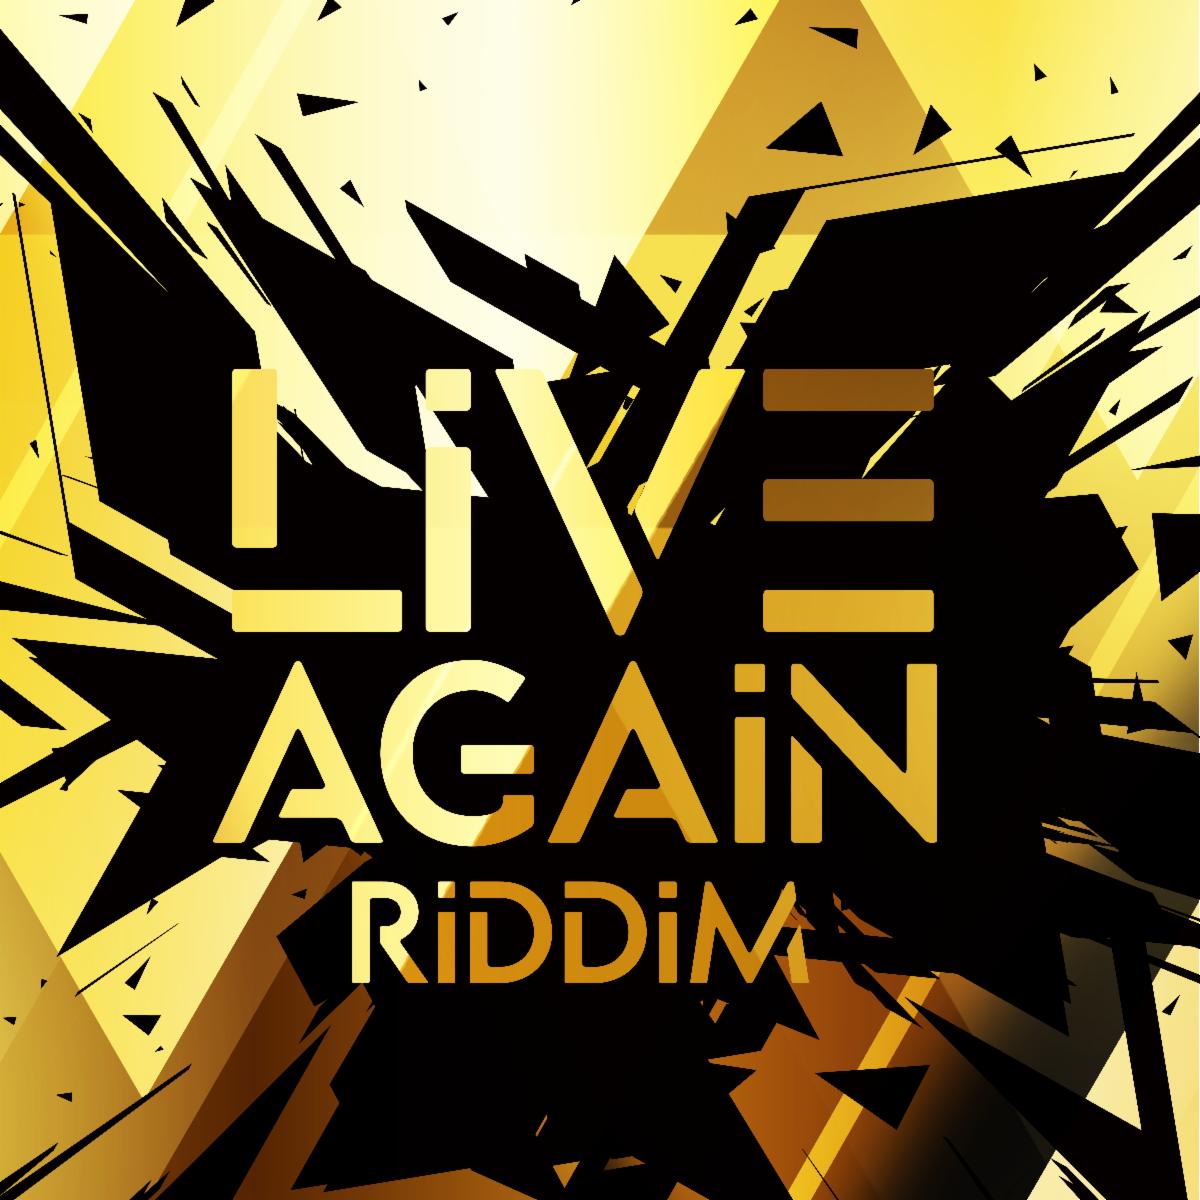 Live Again Riddim